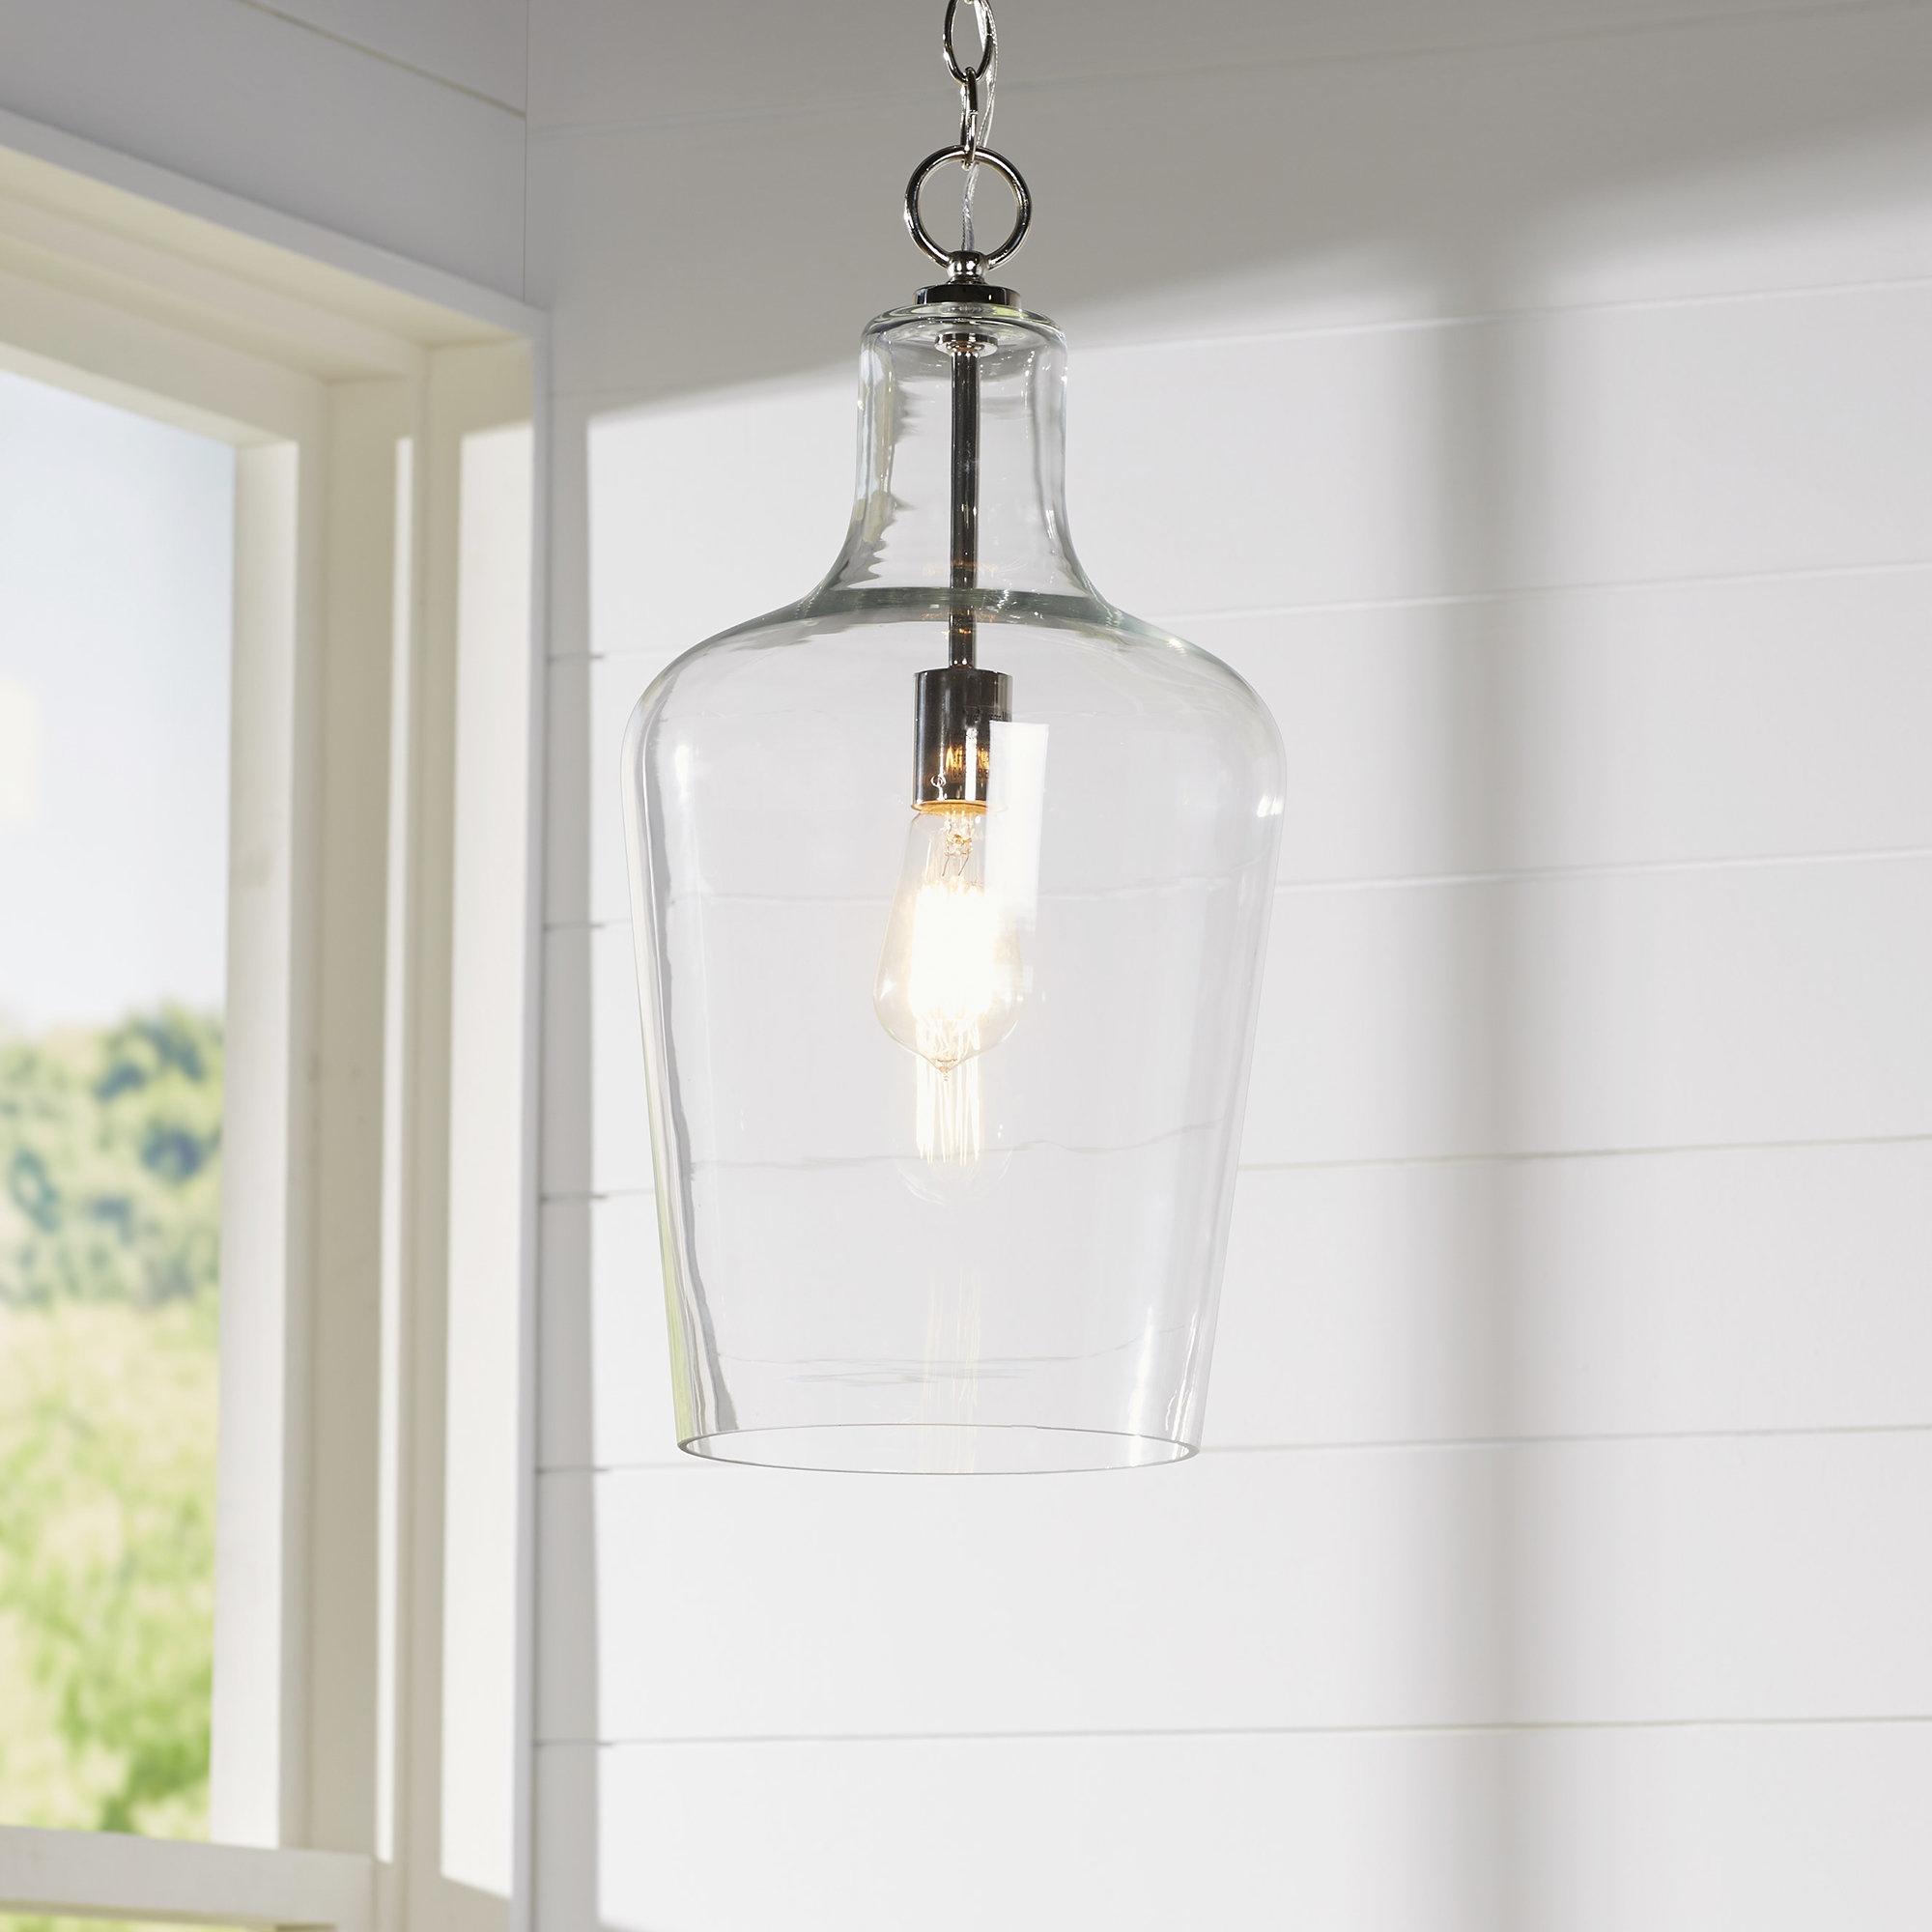 Popular Photo of Carey 1 Light Single Bell Pendants